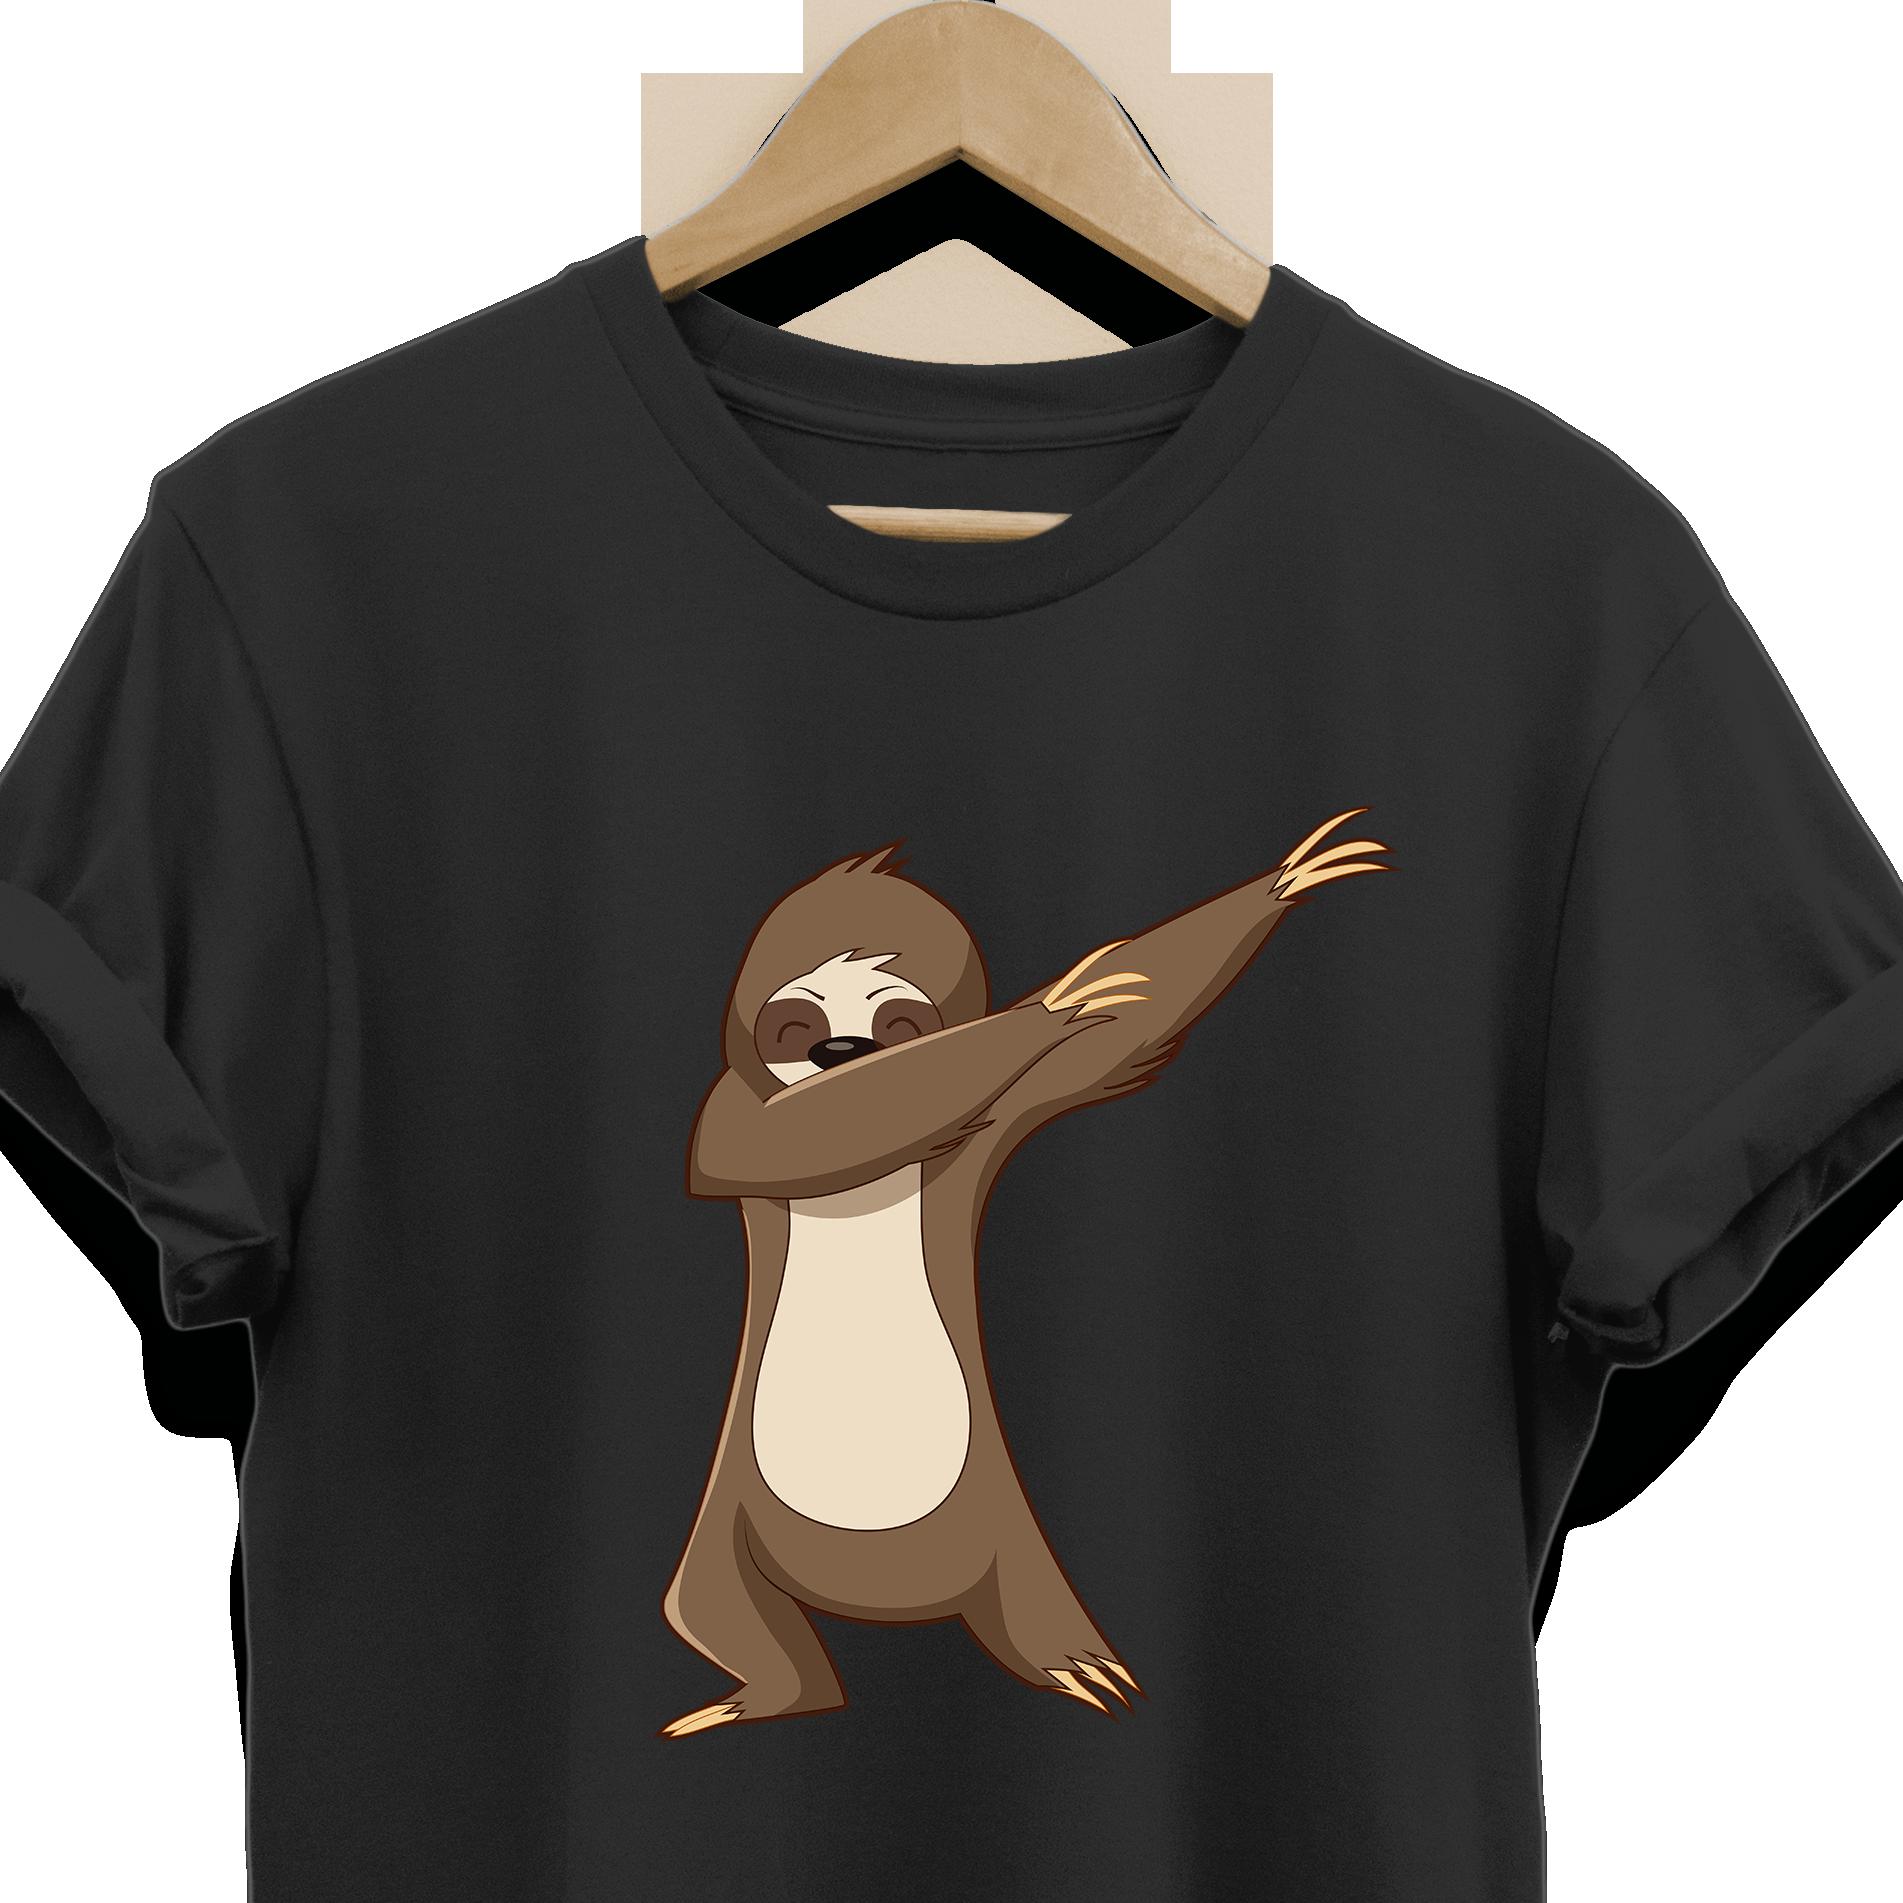 a353733b9717 Dabbing Sloth Tee Shirt for Men Women Boys Girls Kids, Gifts for Sloth  Animal Lovers